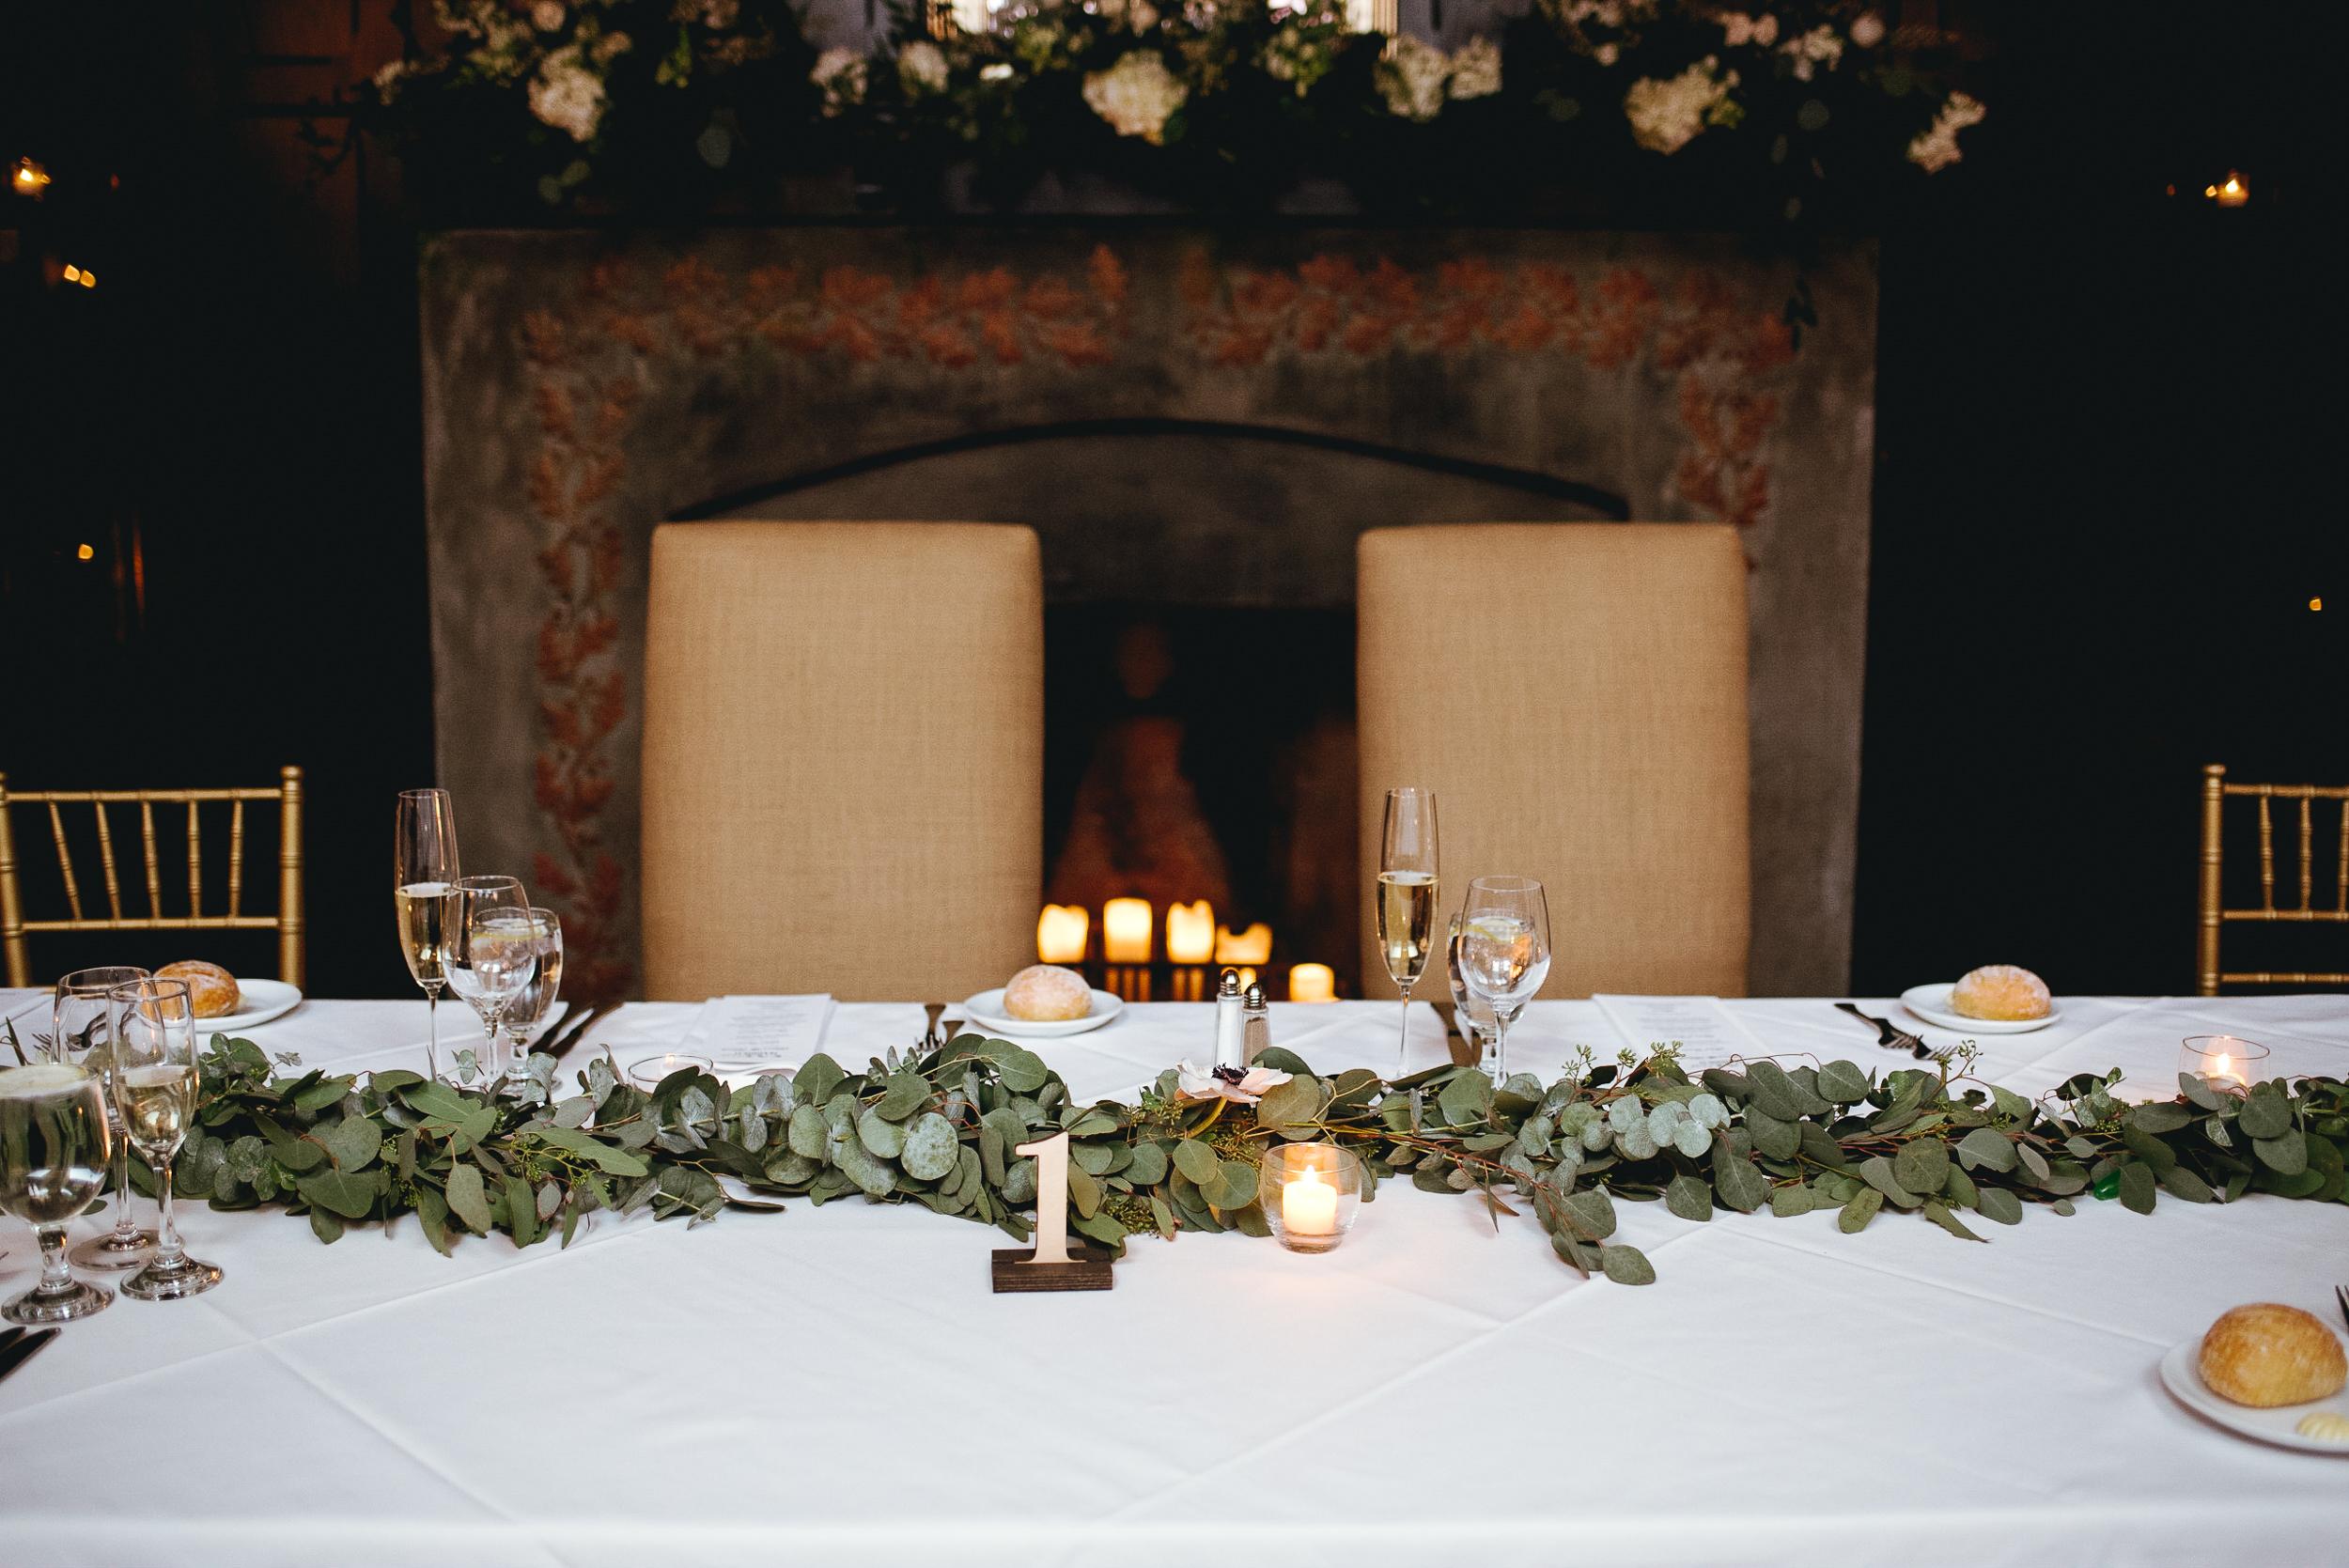 Hotel-du-village-wedding-winter-february-peaberry-photography-philadelphia-photographer-051.jpg